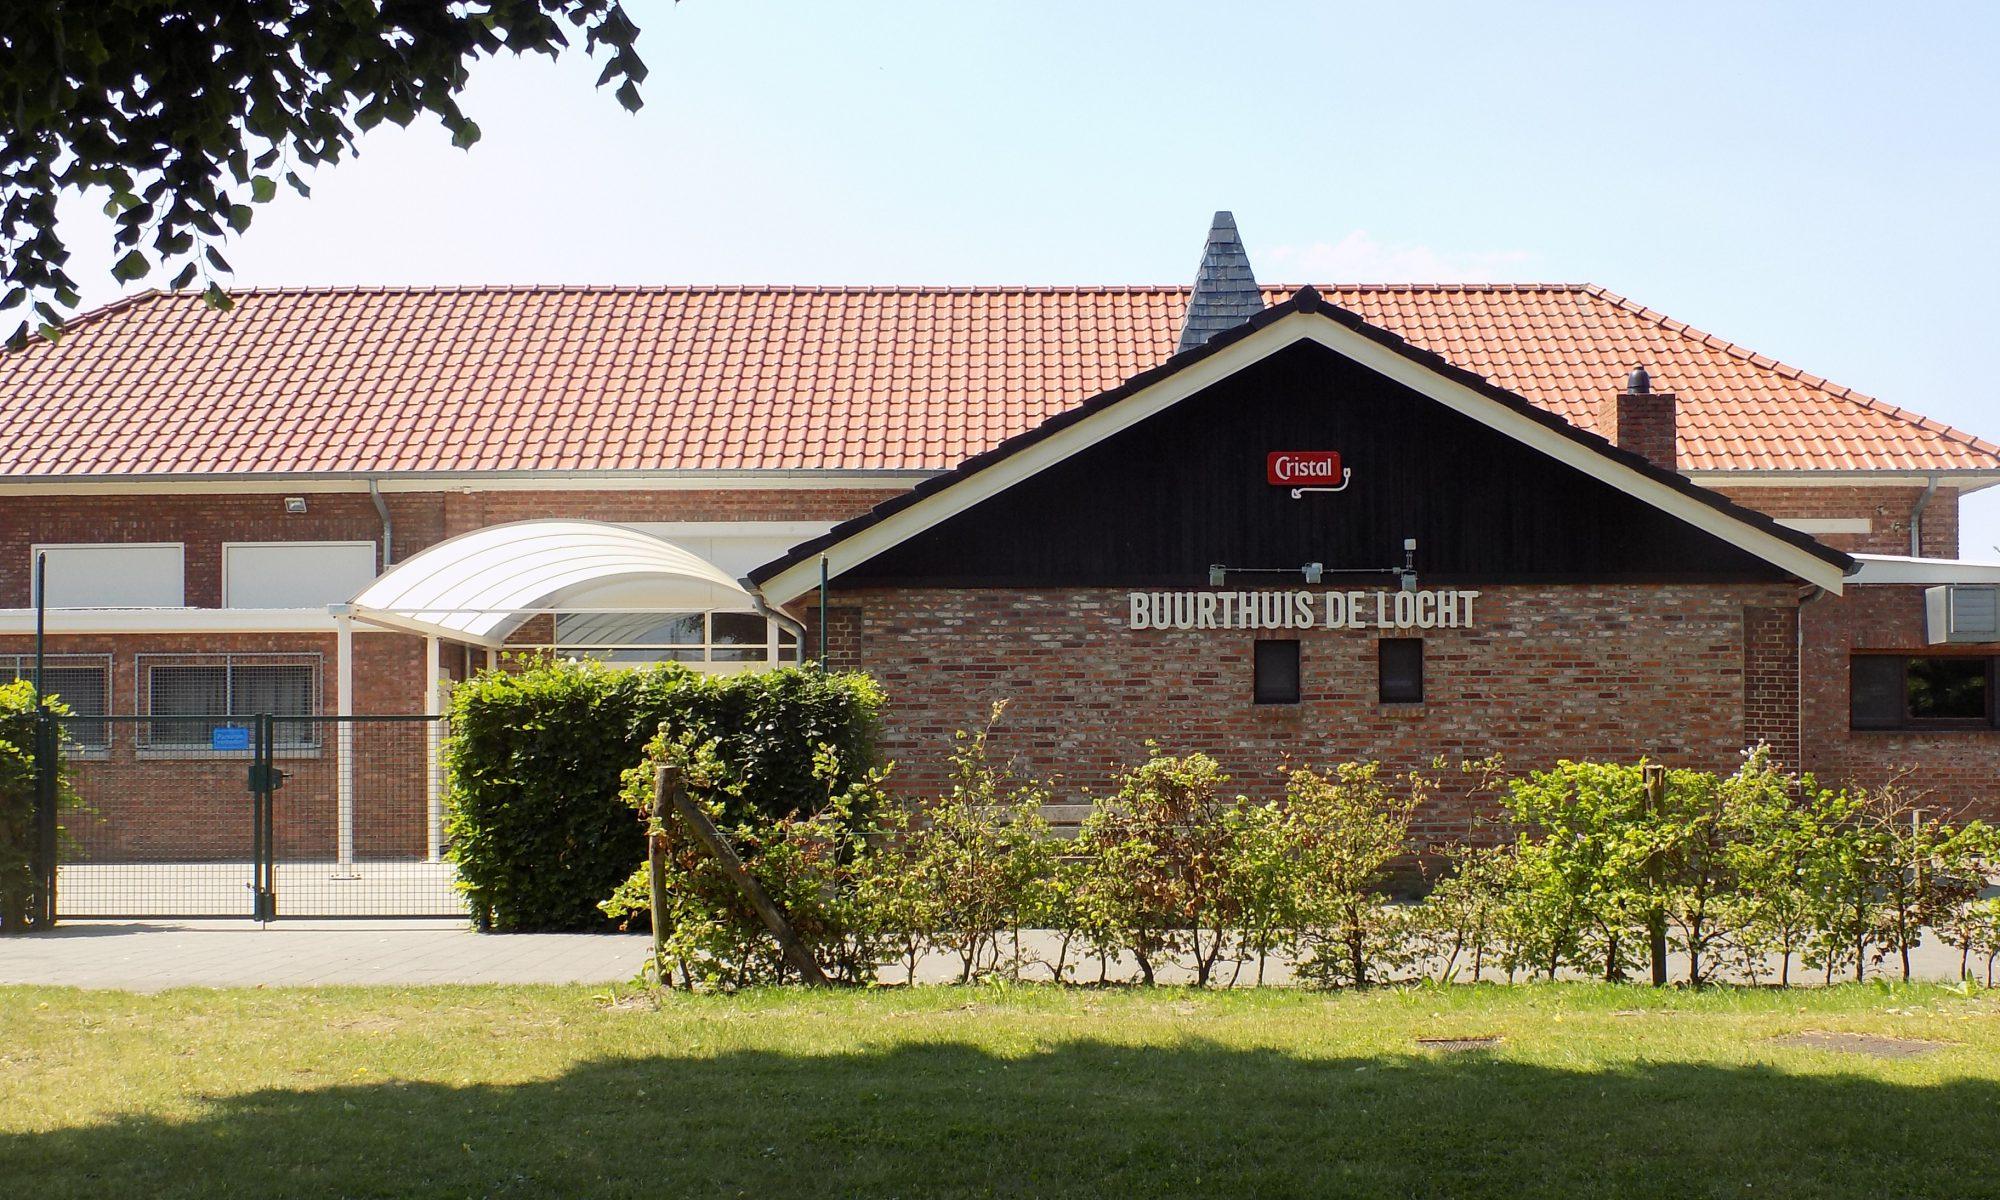 Buurthuis de Locht